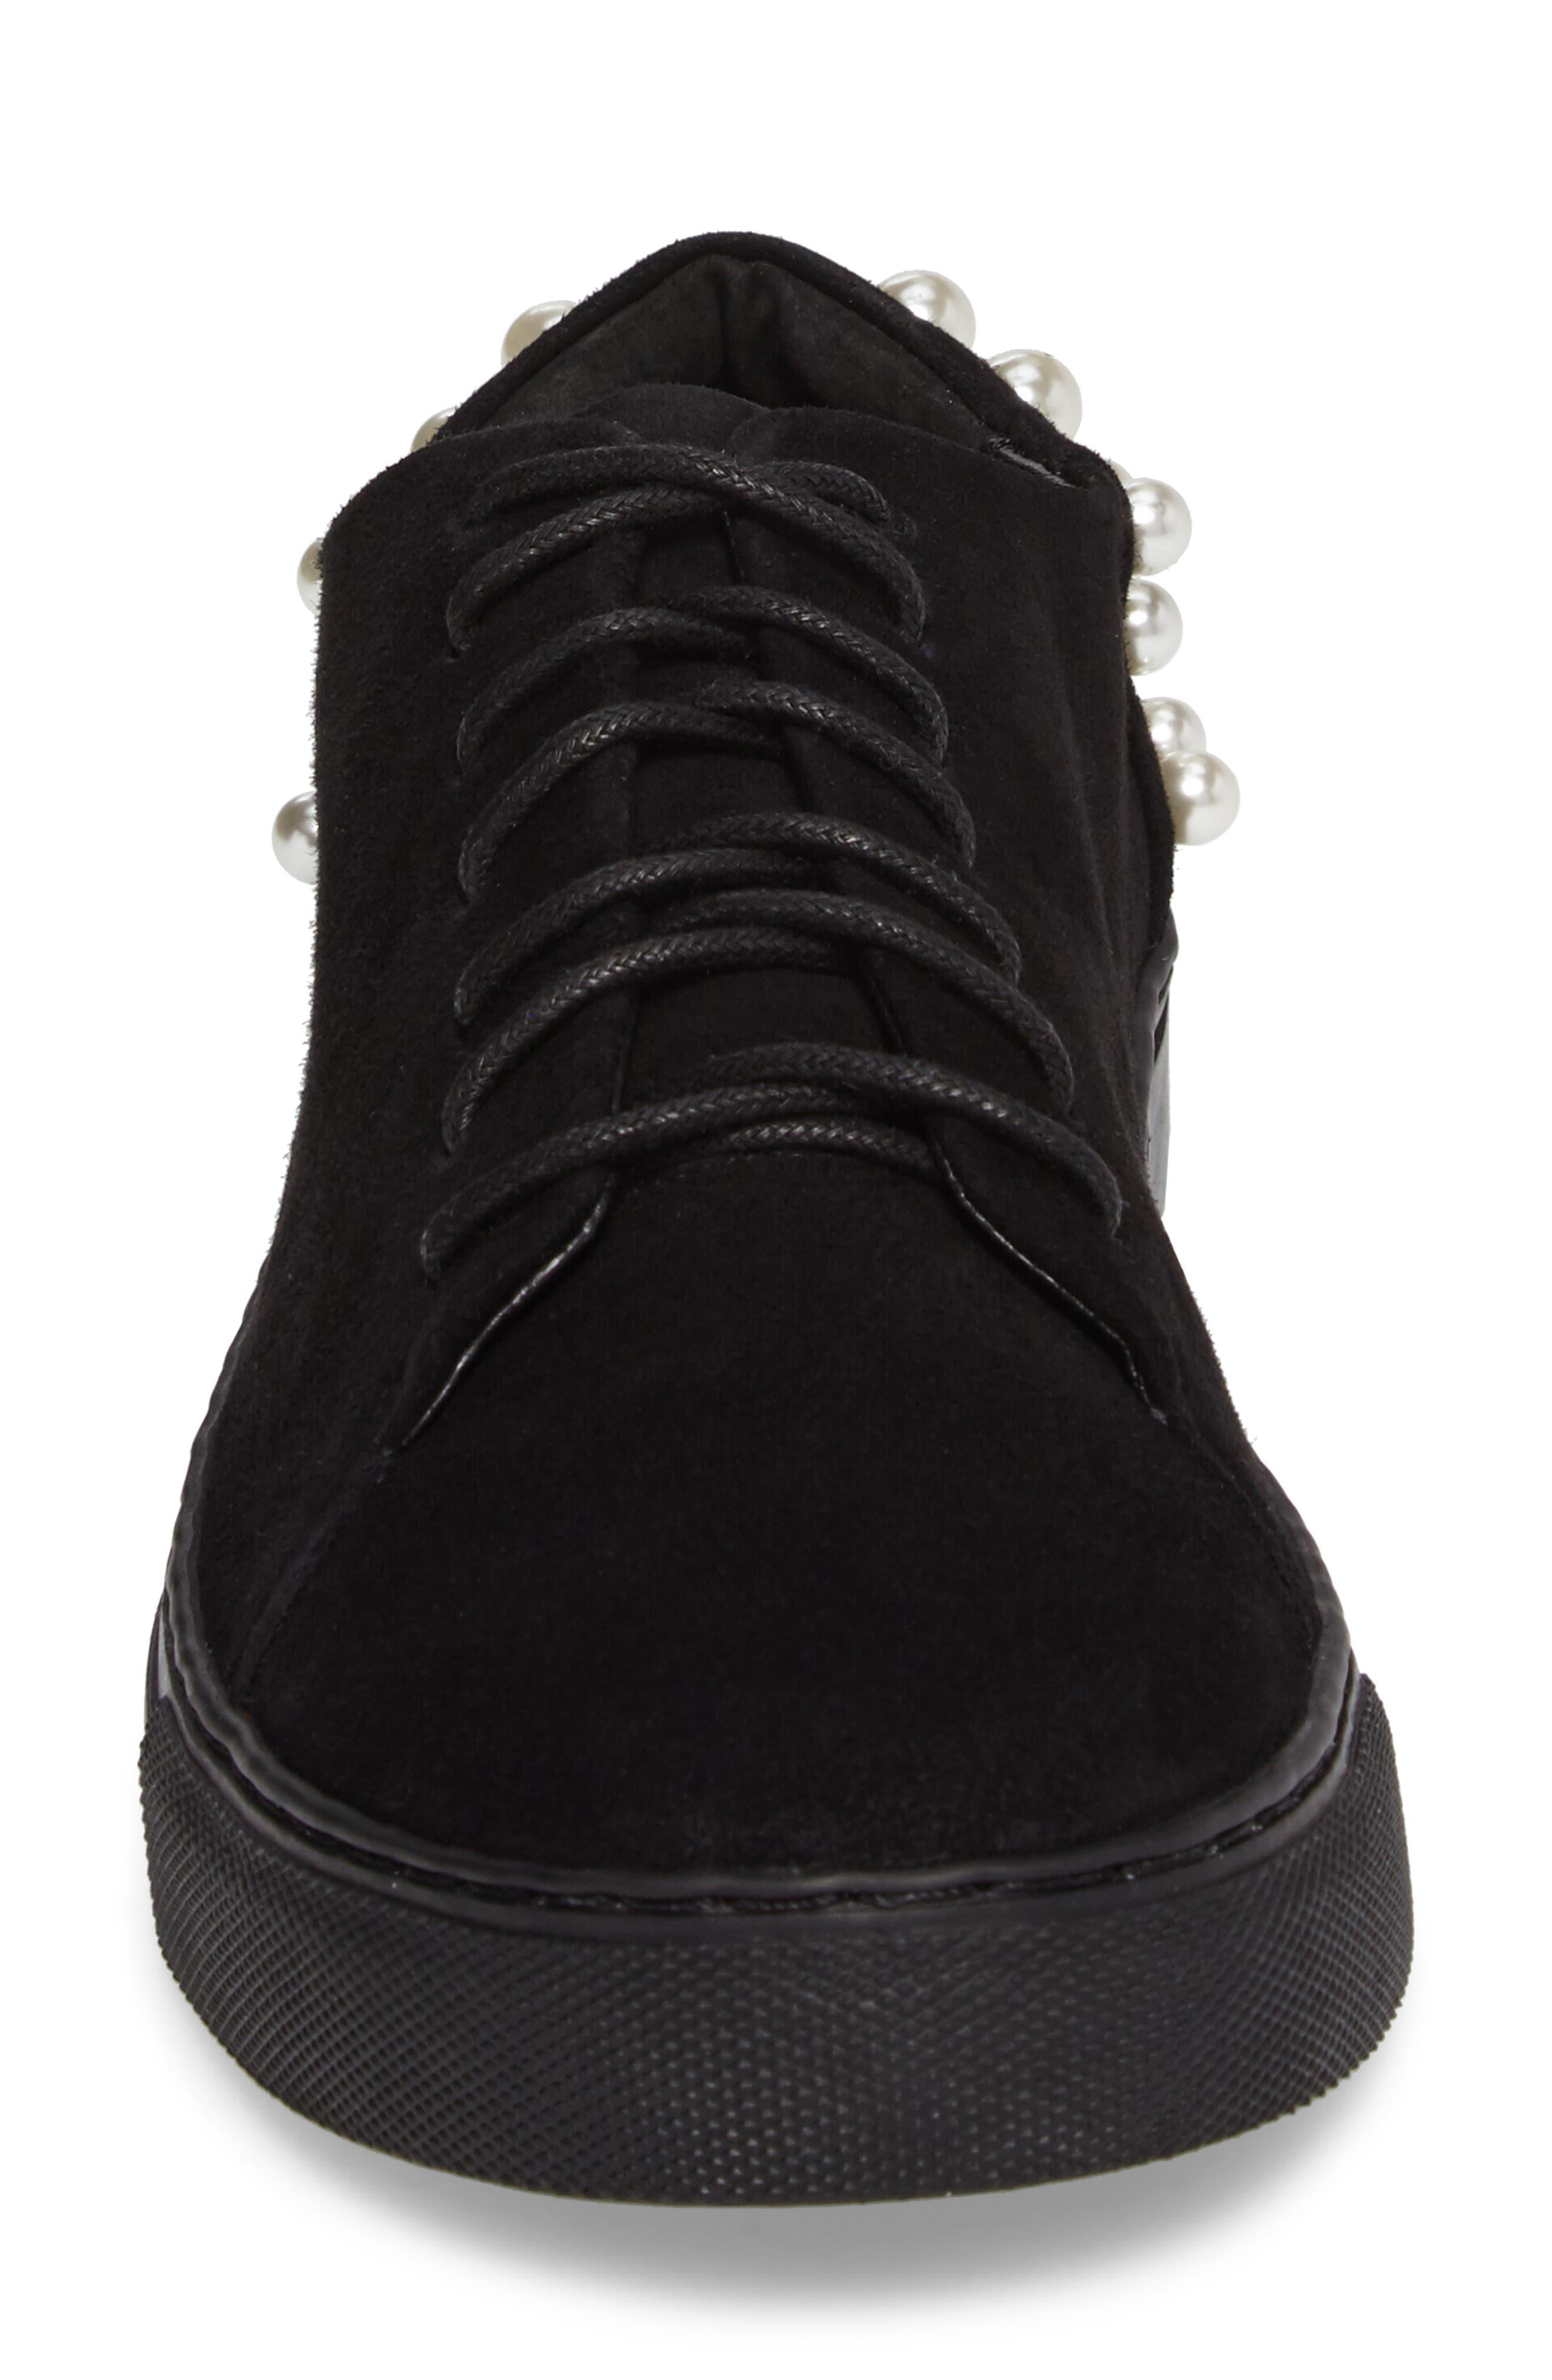 Haig Embellished Sneaker,                             Alternate thumbnail 4, color,                             Black